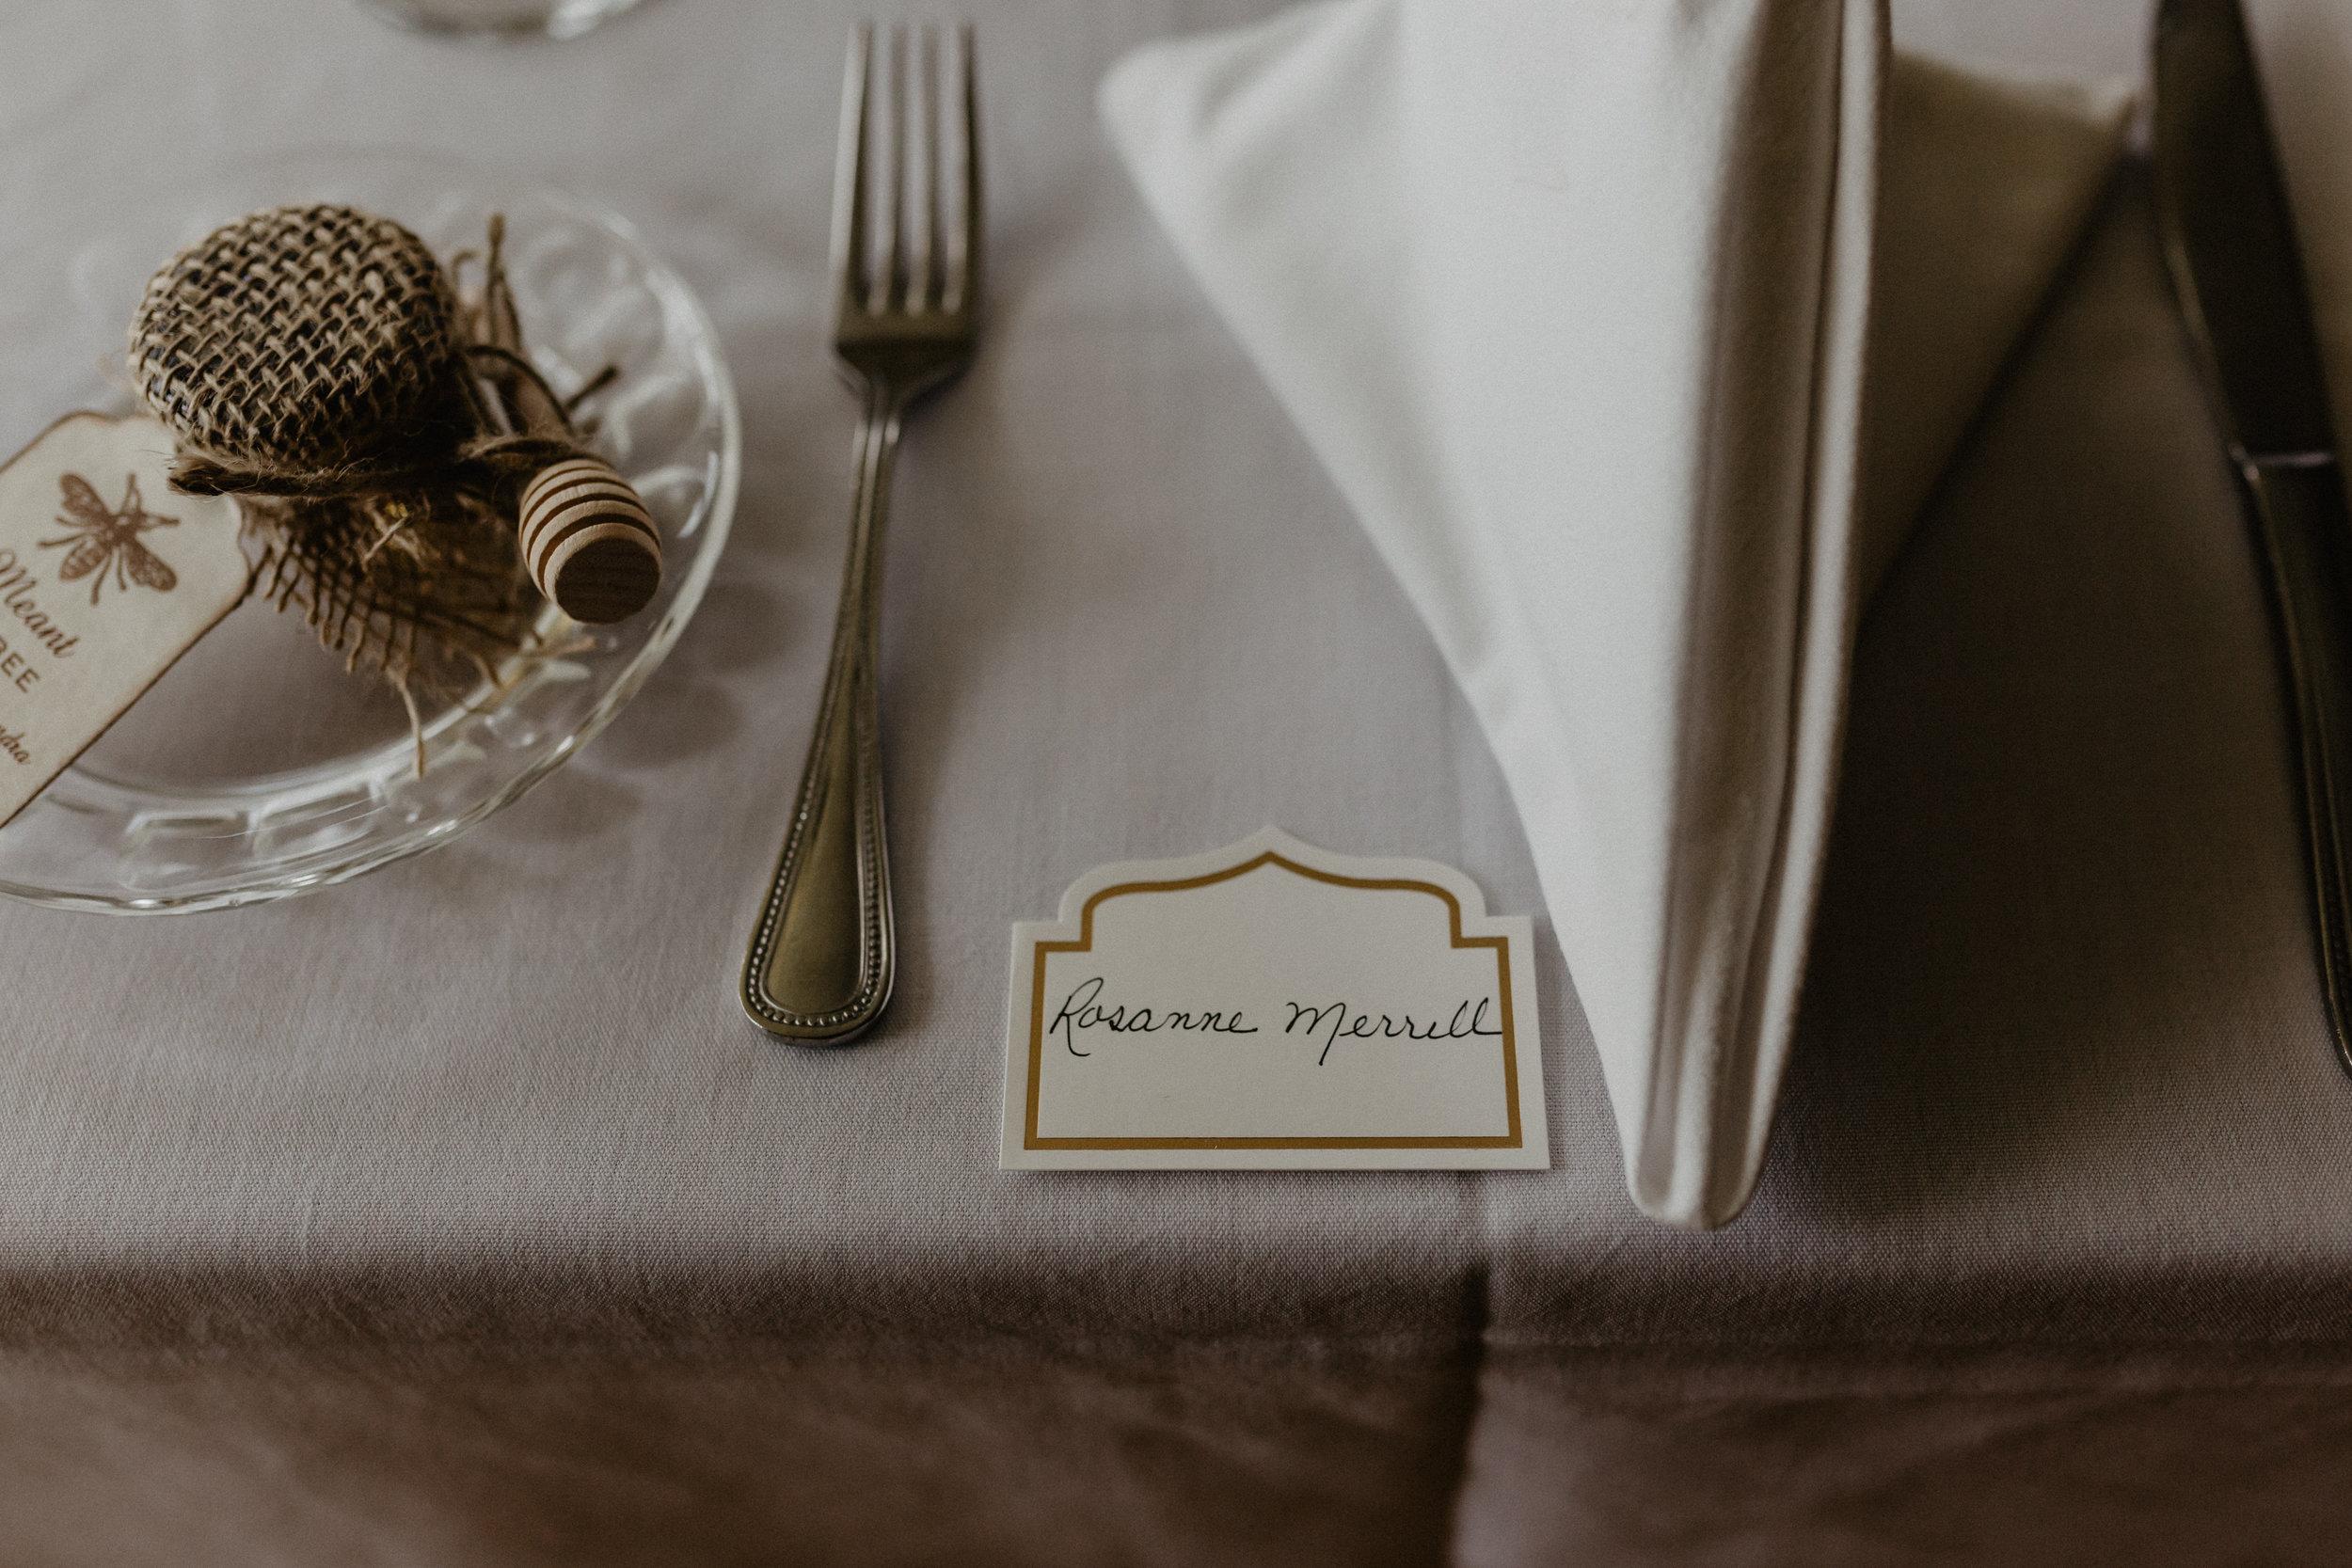 upstate_ny_wedding-37.jpg